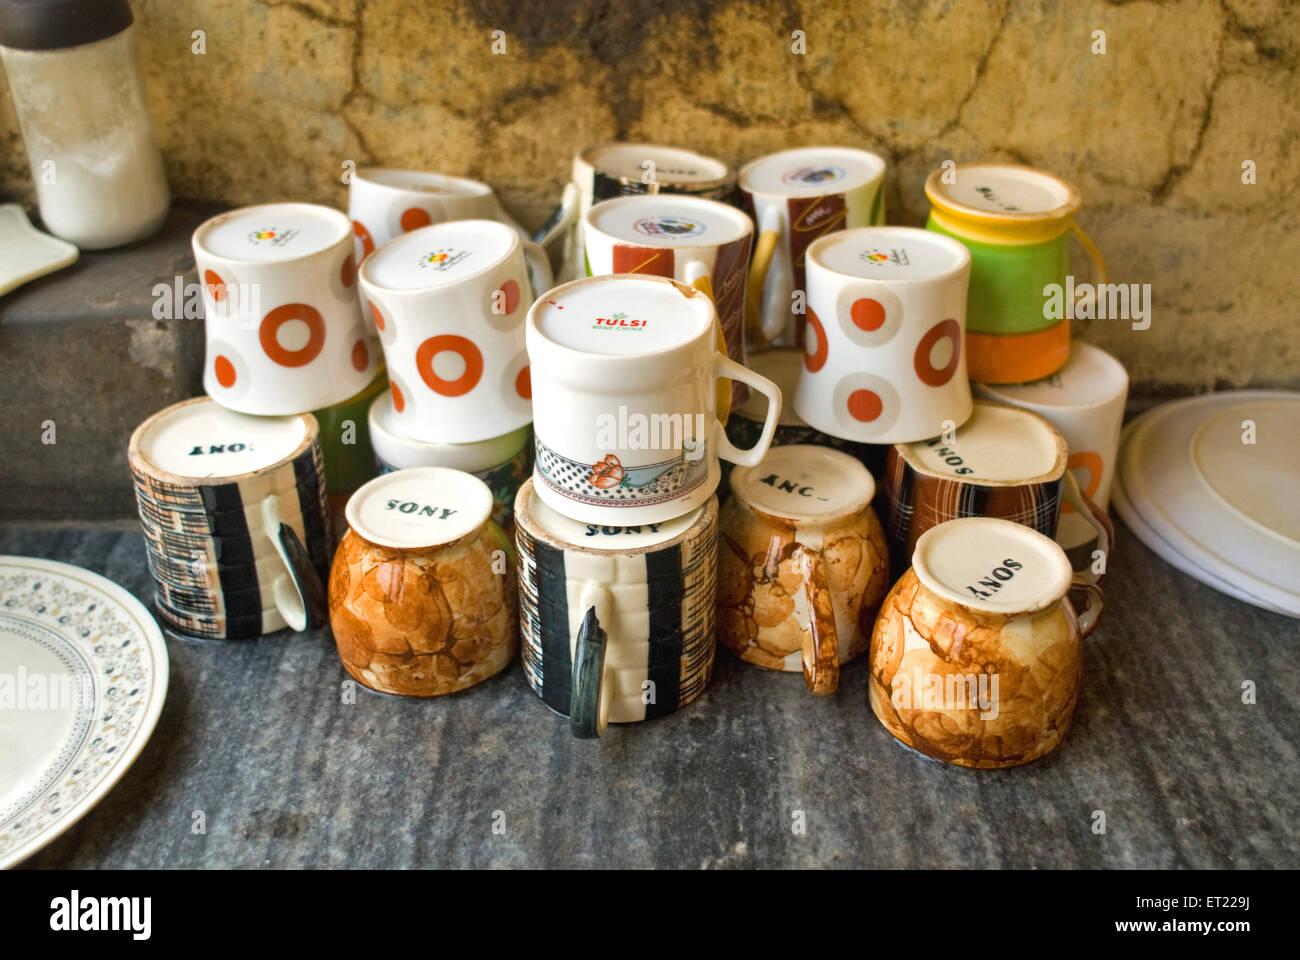 Tea Cups at Bhowanipur ; Calcutta Kolkata ; West Bengal ; India - Stock Image